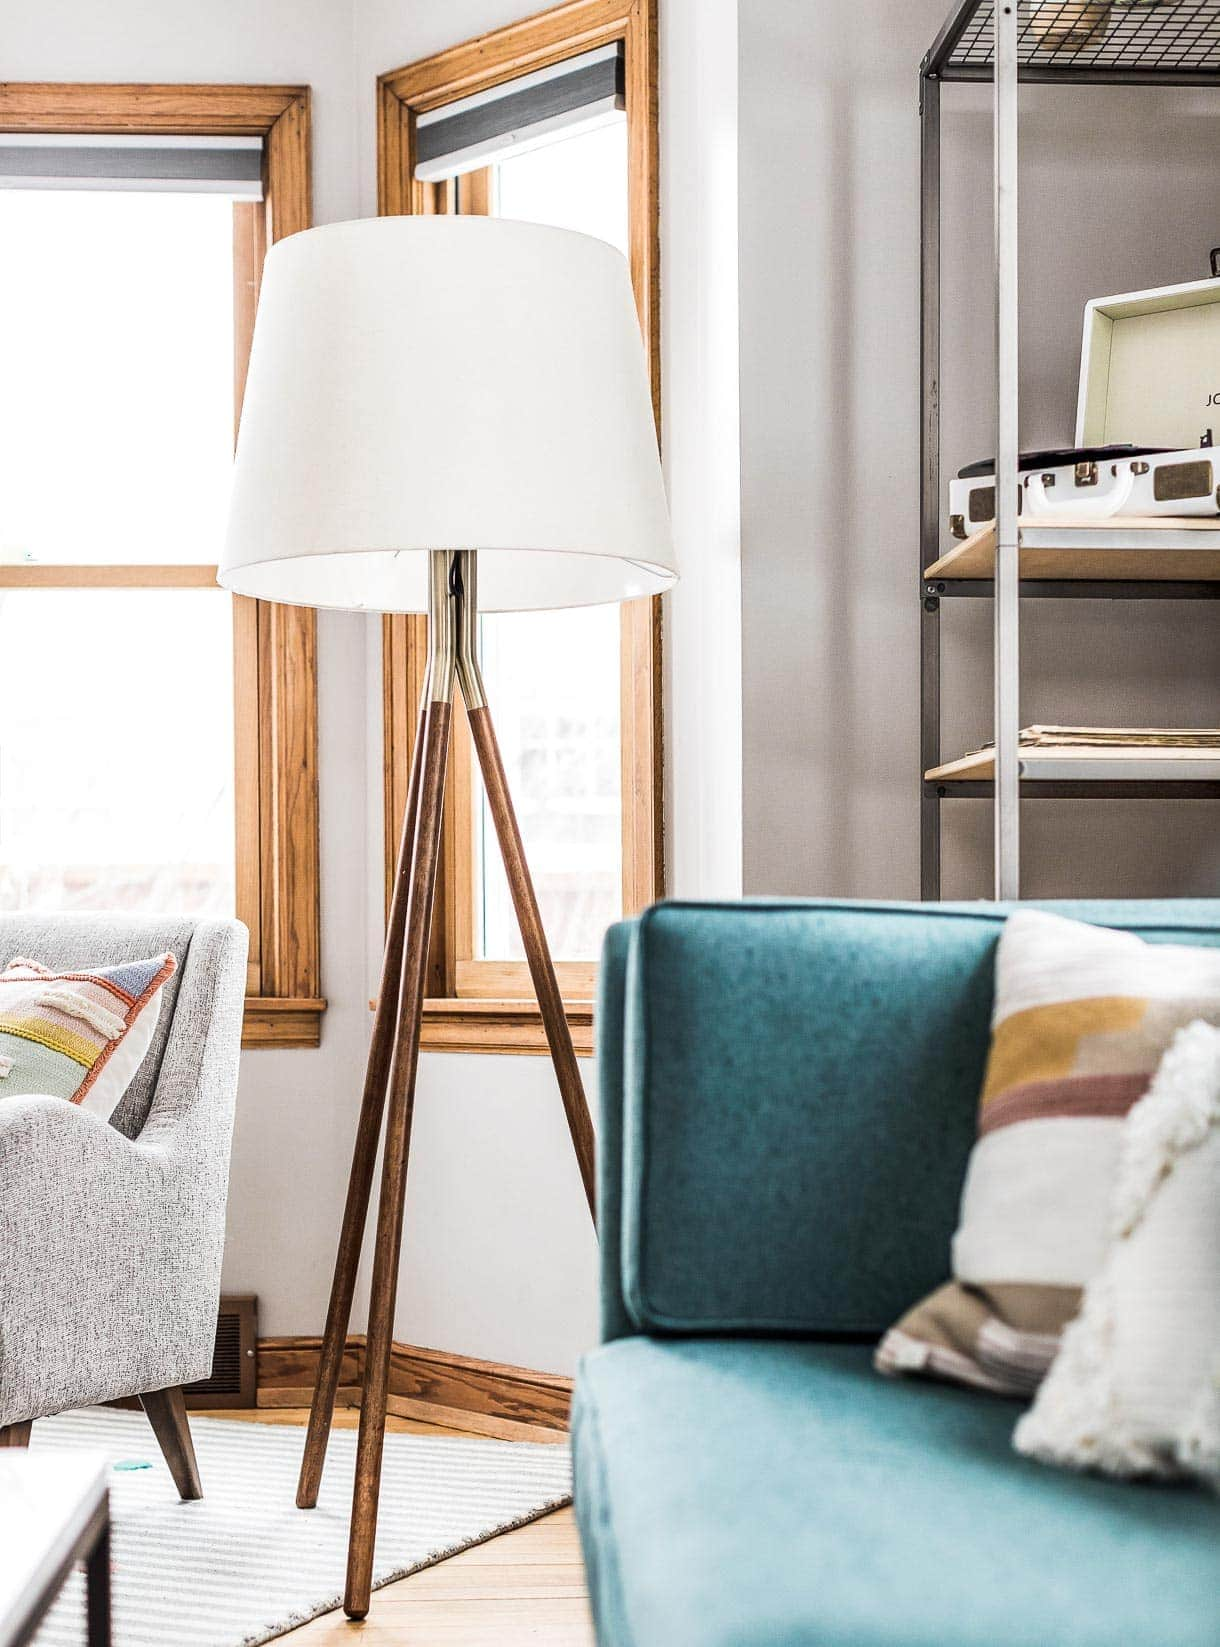 crate and barrel floor lamp, tripod floor lamp